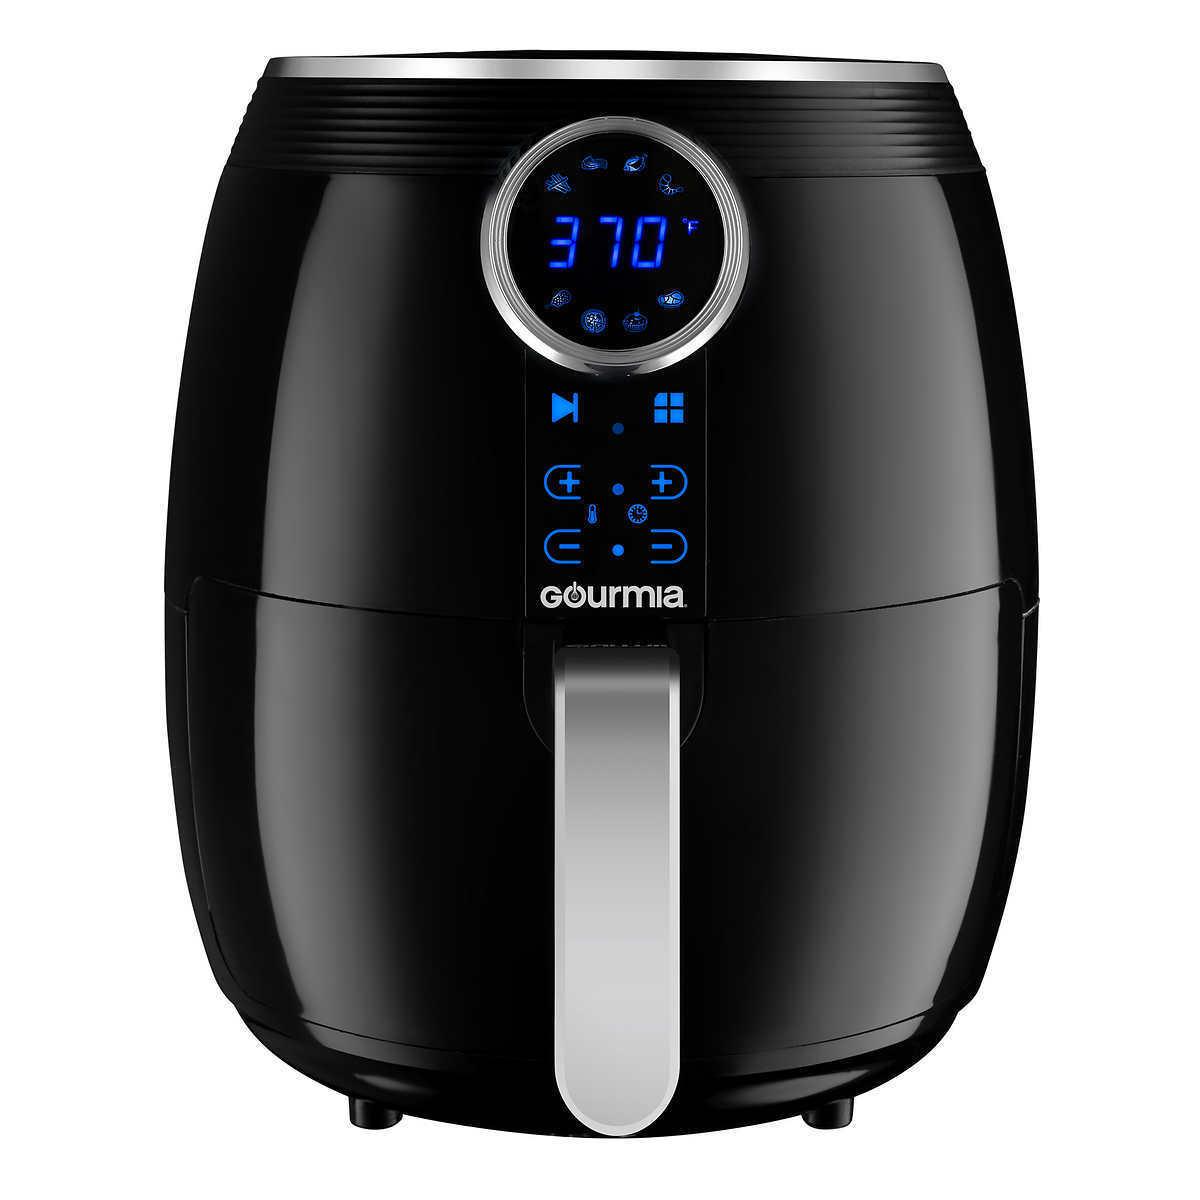 Gourmia Air Fryer 5 qt. Digital Display Oil Free Healthy Cooking Frying